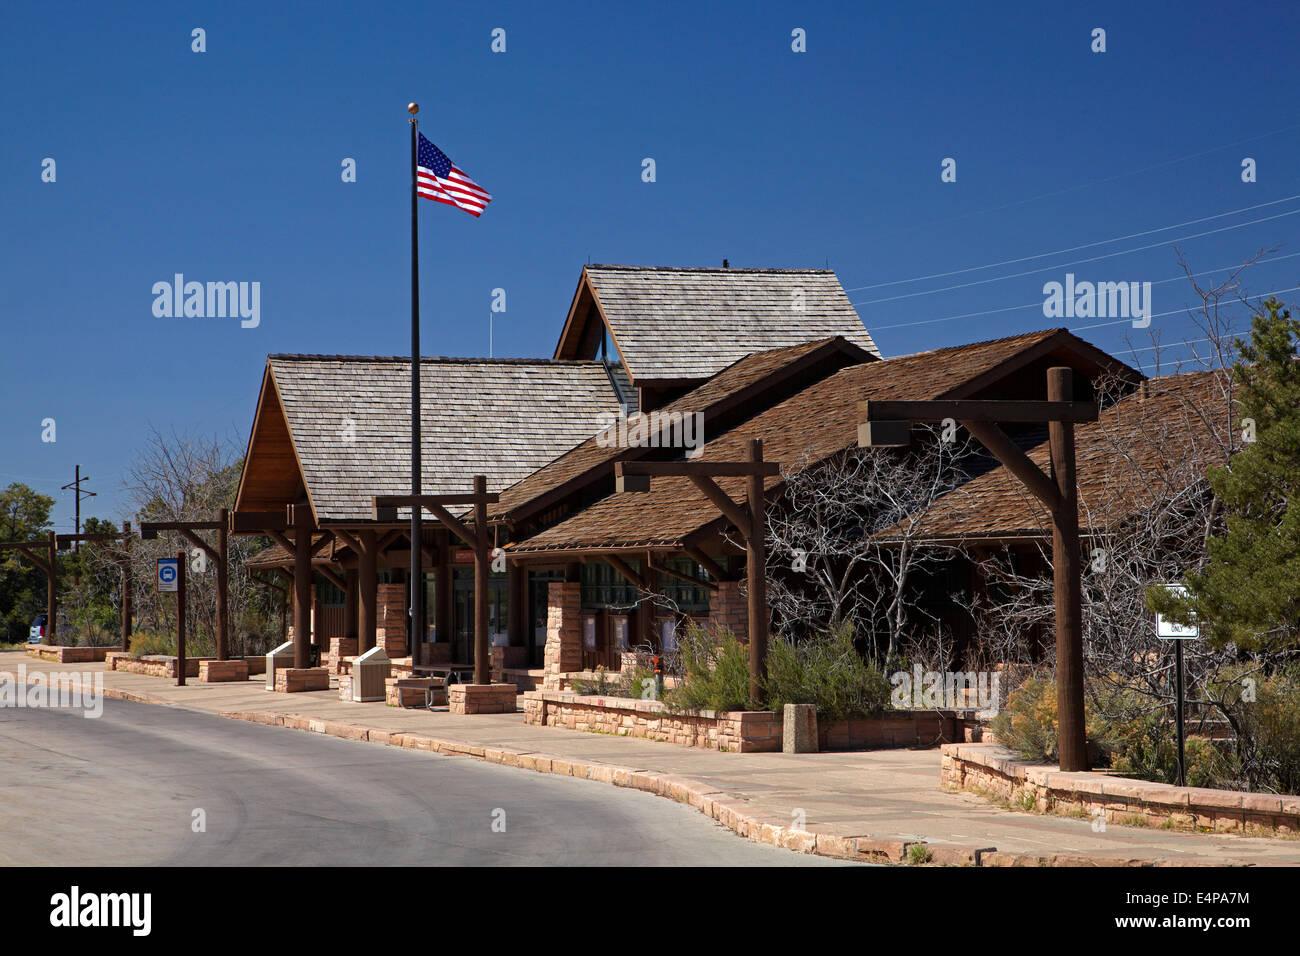 Backcountry Information Center, Grand Canyon Village, South Rim, Grand Canyon National Park, Arizona, USA - Stock Image